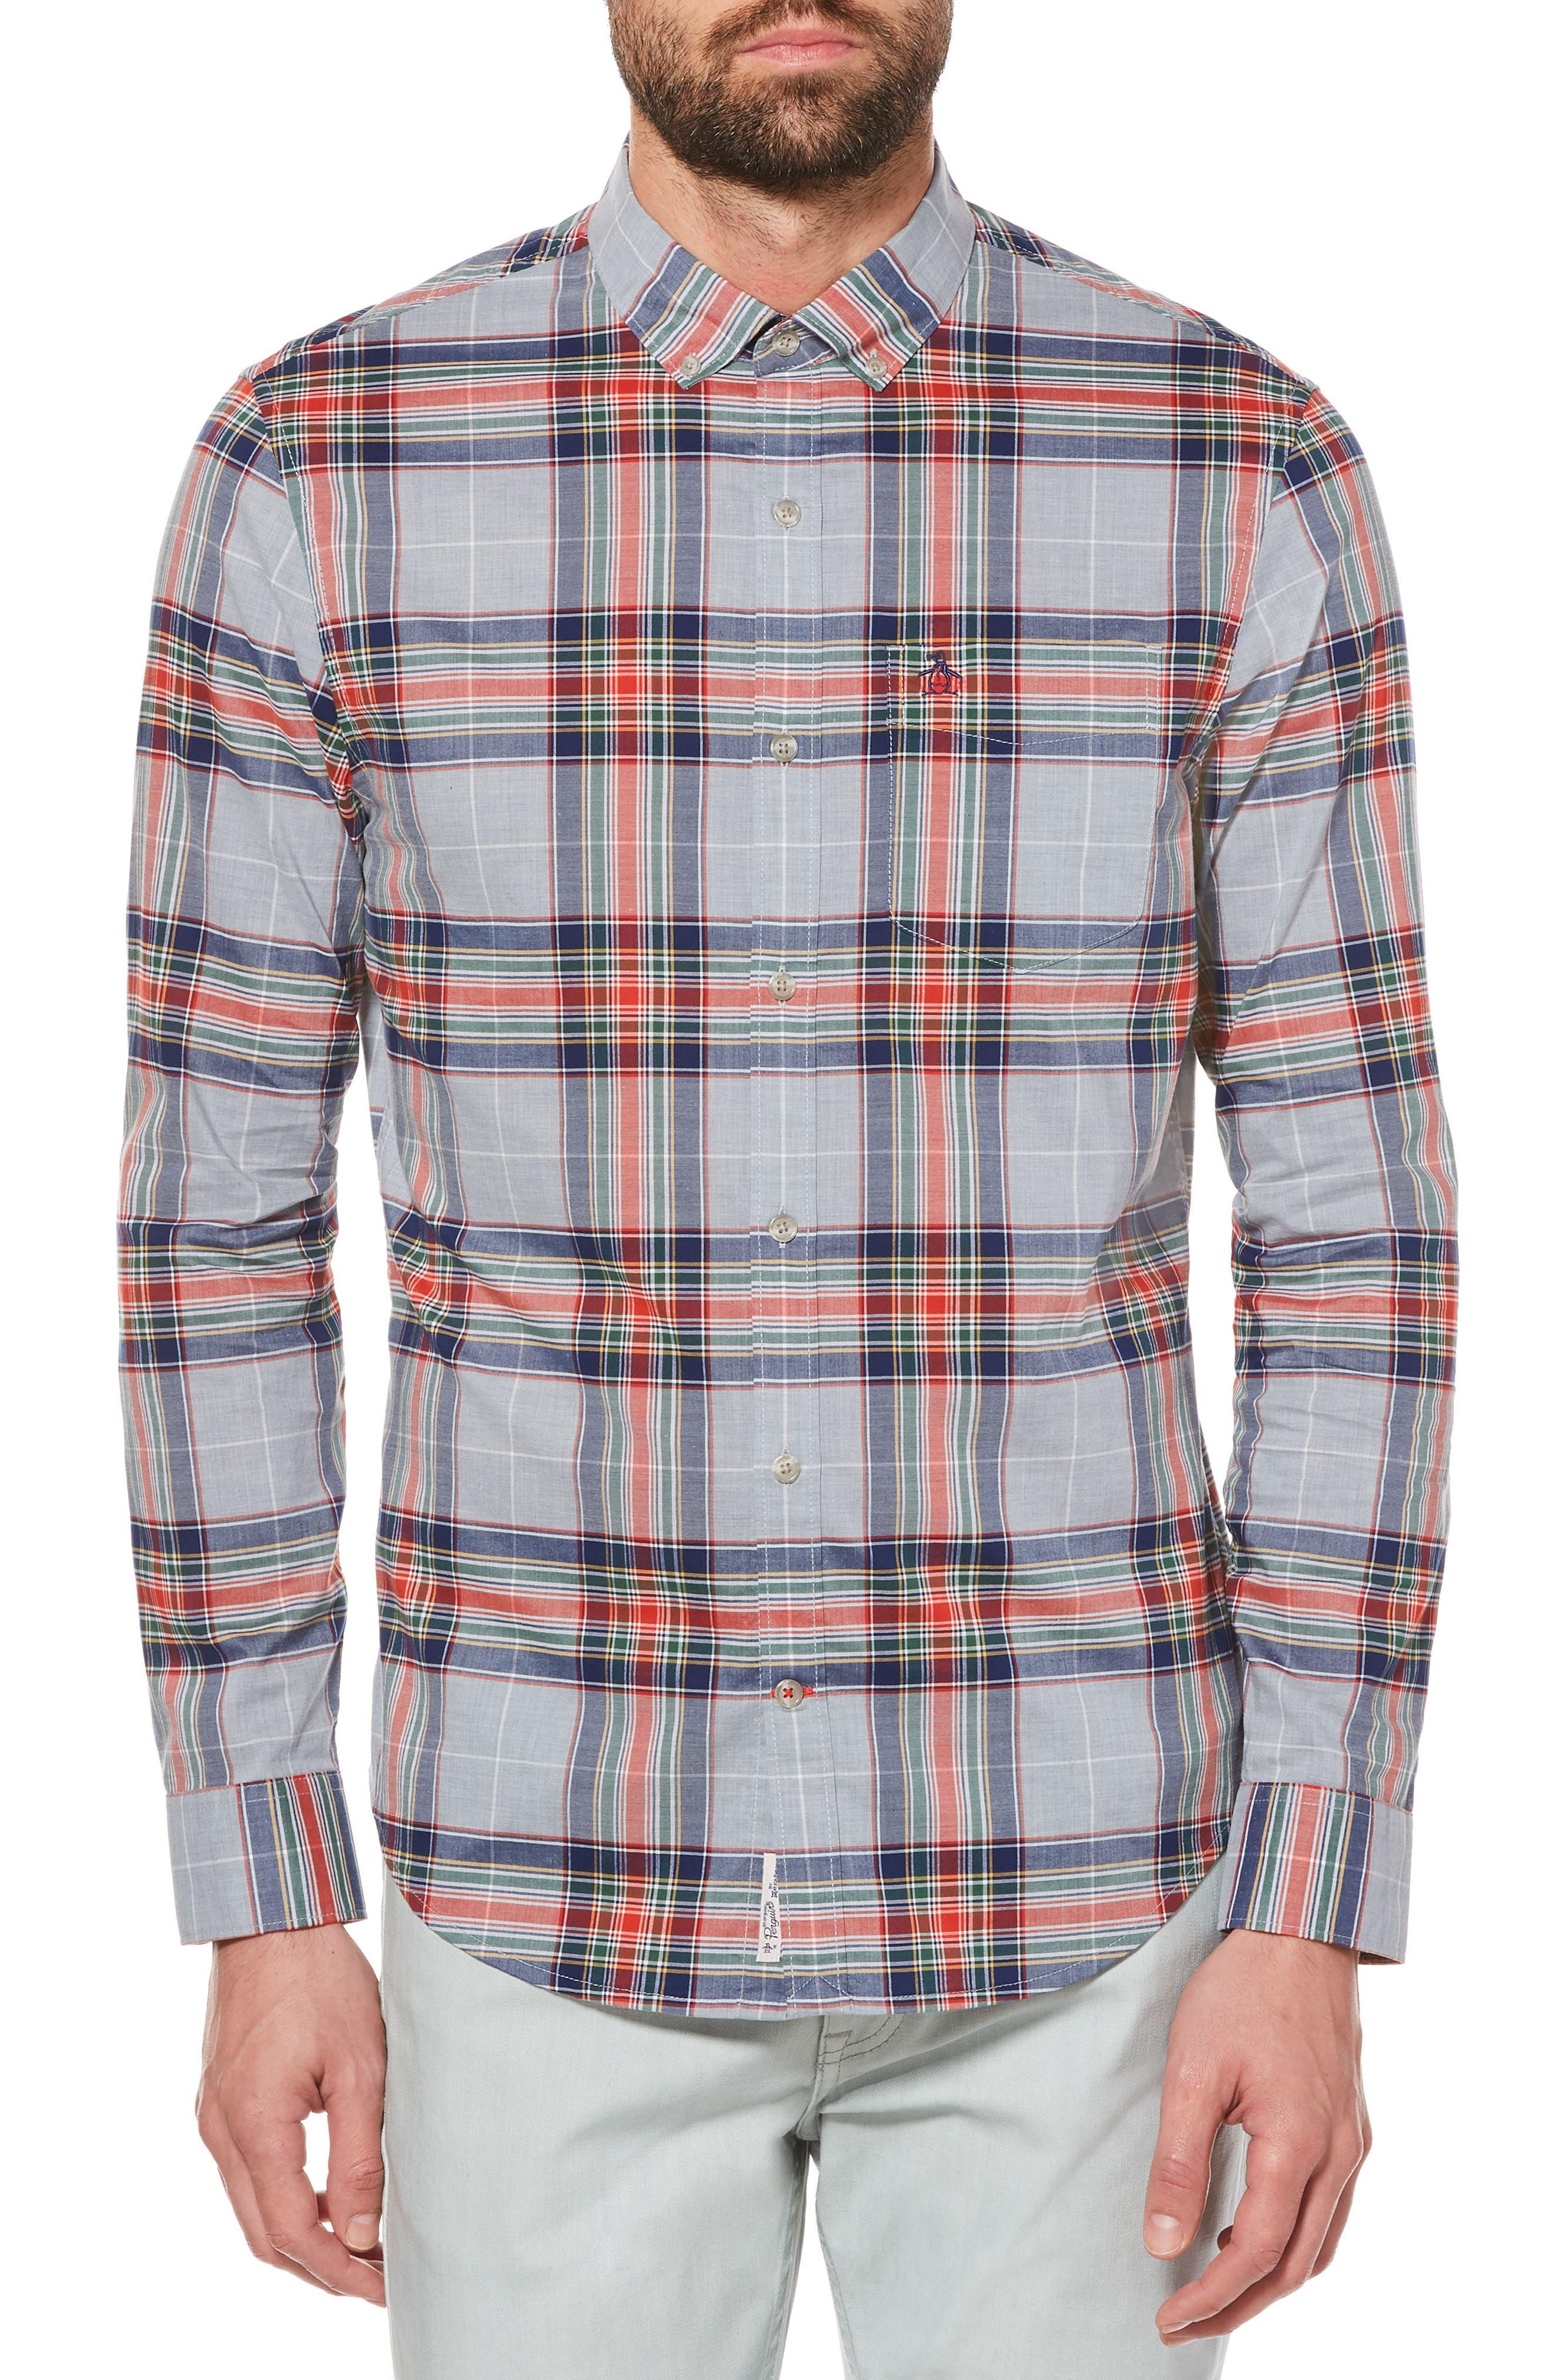 Main Image - Original Penguin P55 Heritage Slim Fit Plaid Shirt